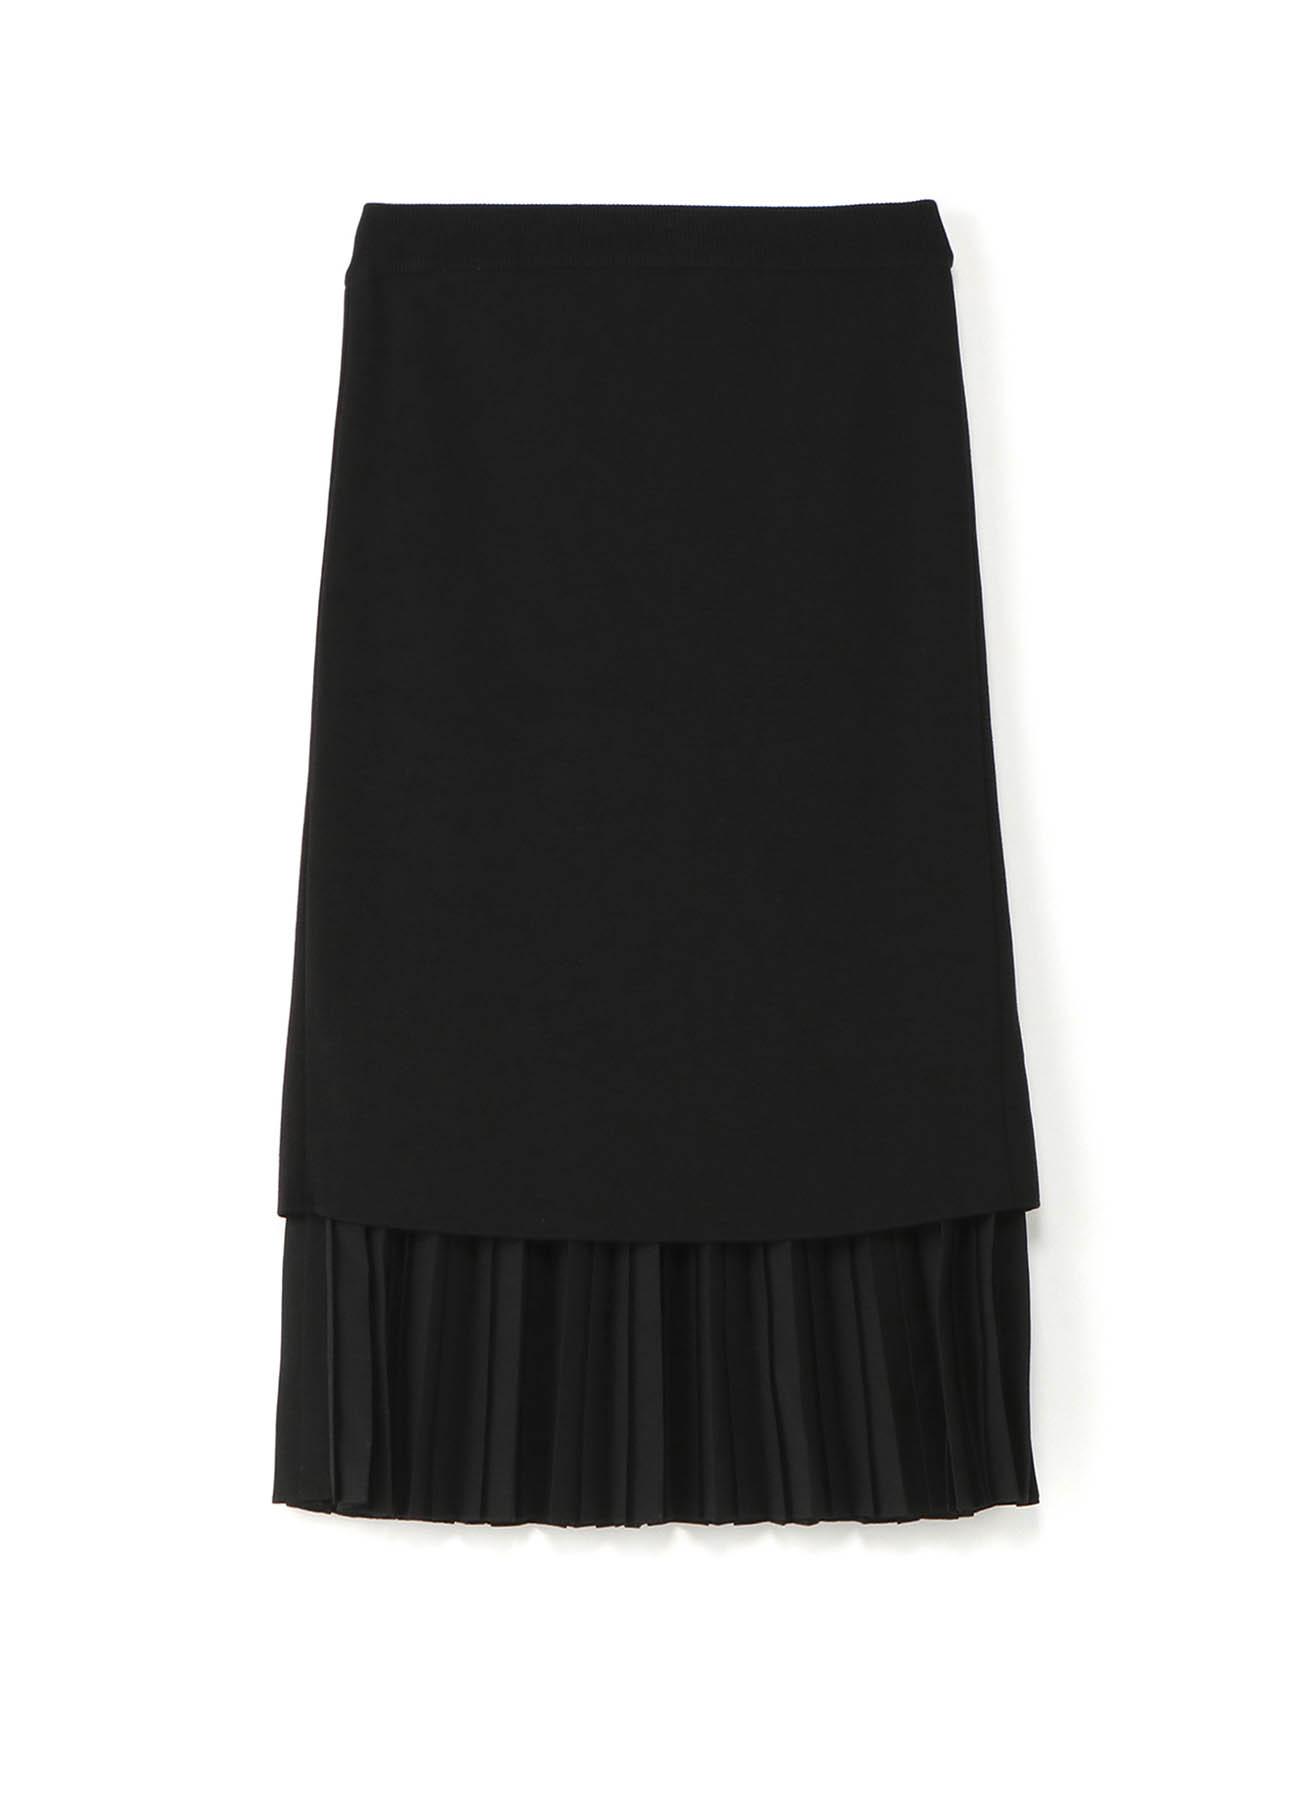 RISMATbyY's ニットxプリーツ バックスリットスカート